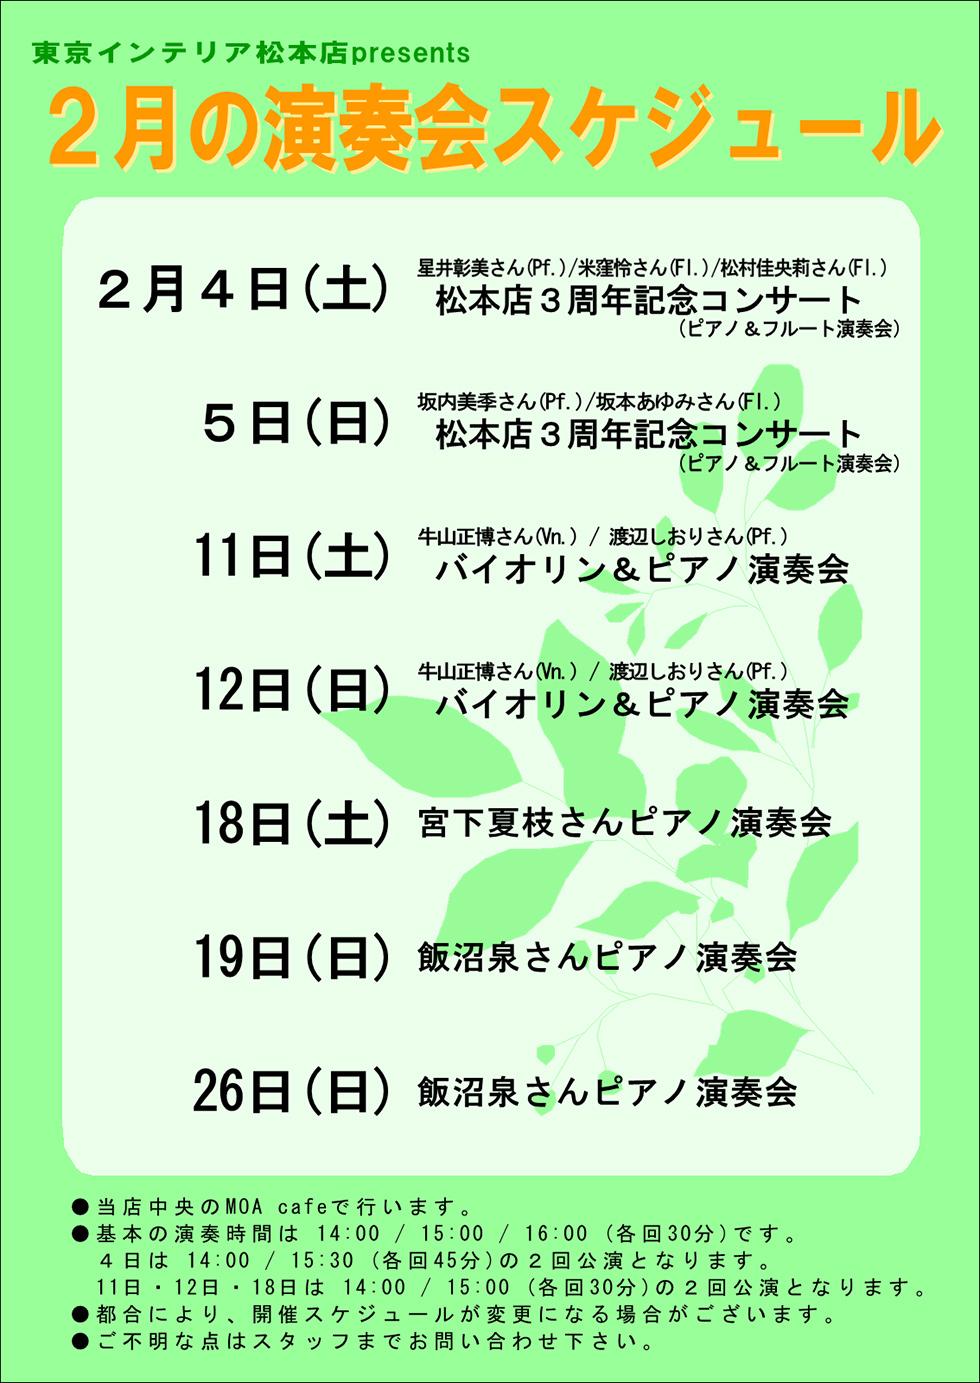 matsumoto_enso_201702